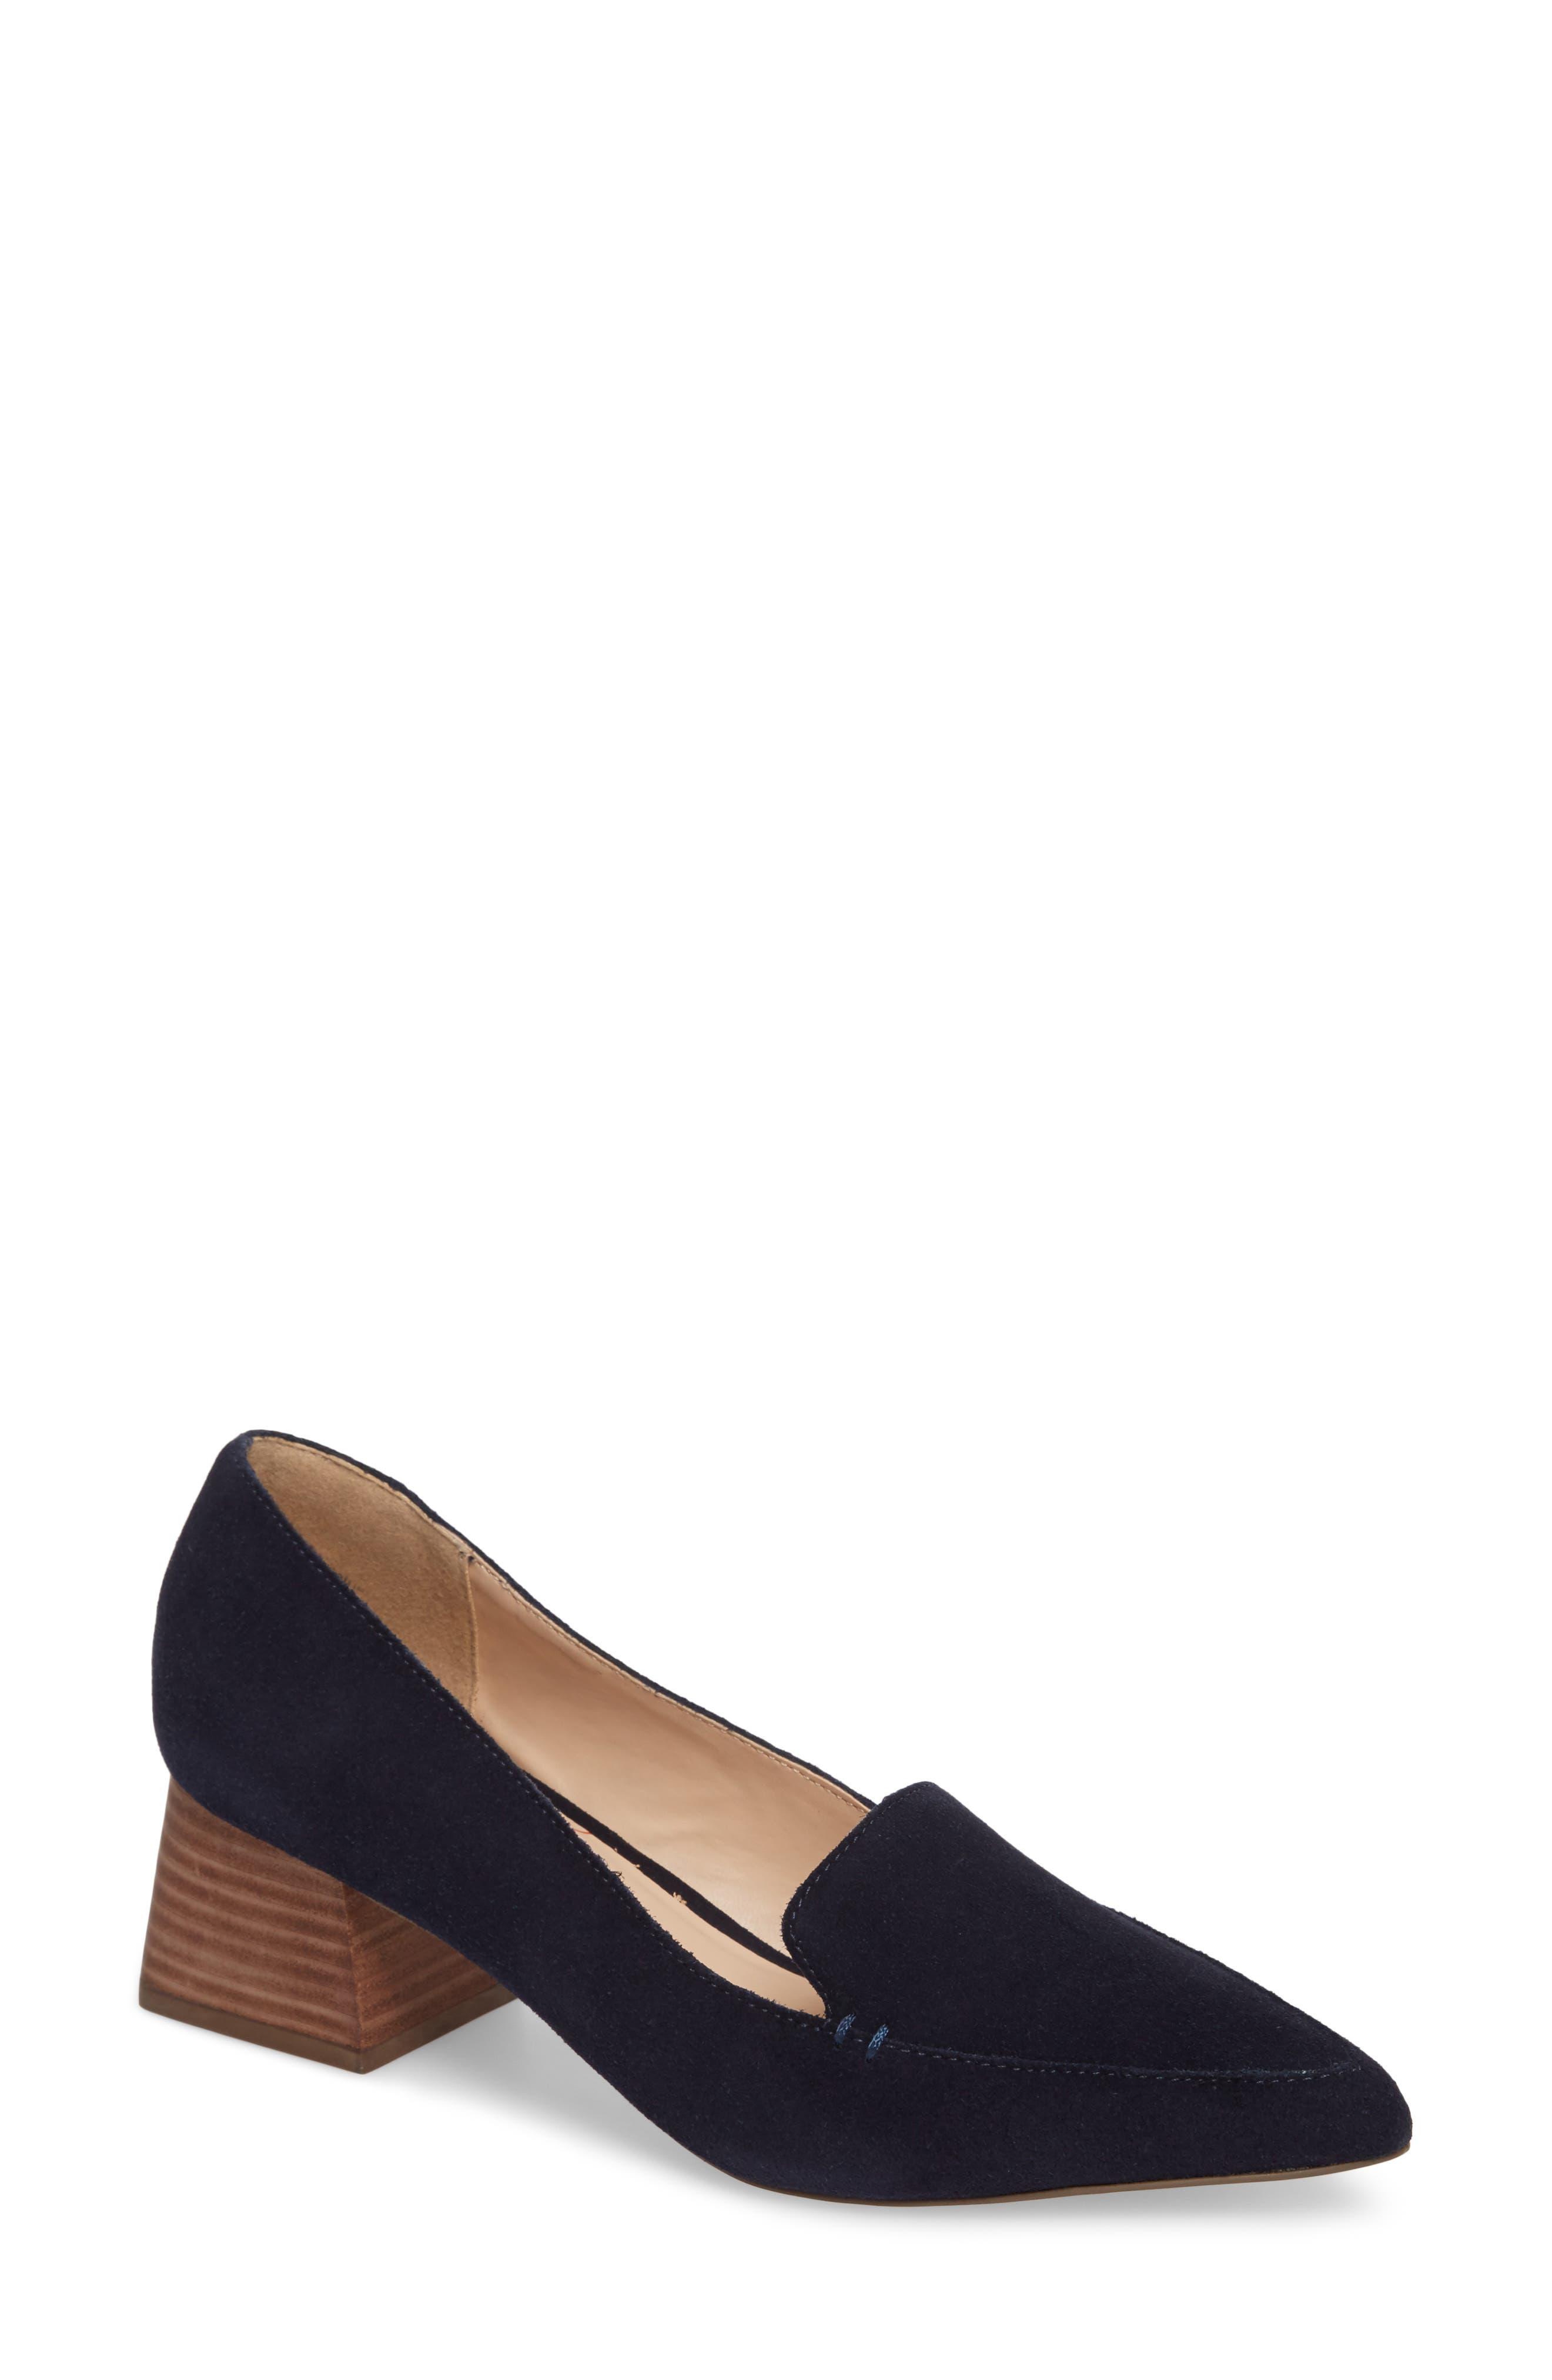 Mavis Flare Heel Loafer,                             Main thumbnail 1, color,                             Ombre Blue